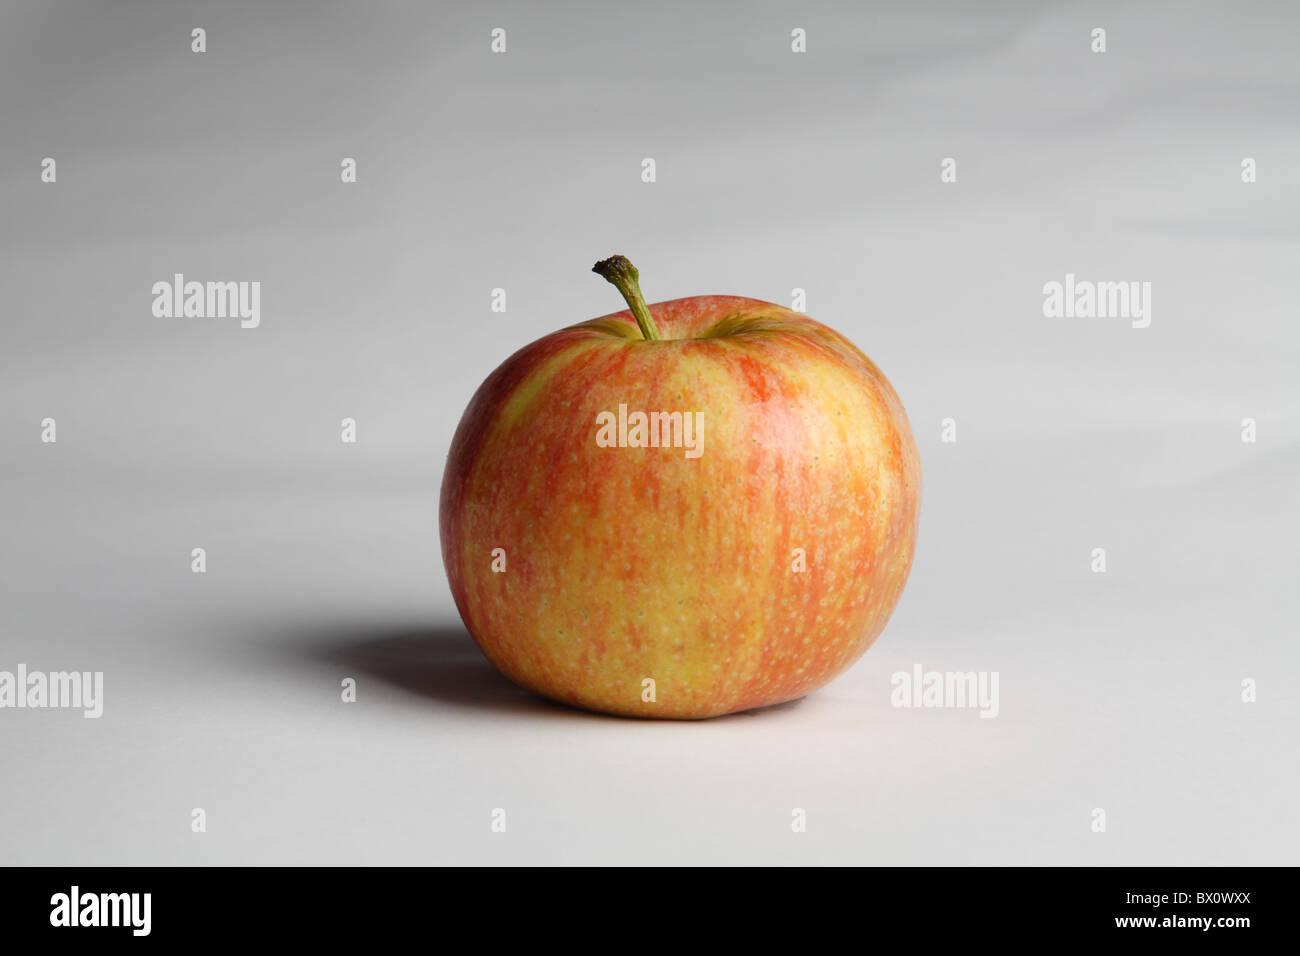 fruit, apple, isolate, manzana acid skin sante - Stock Image